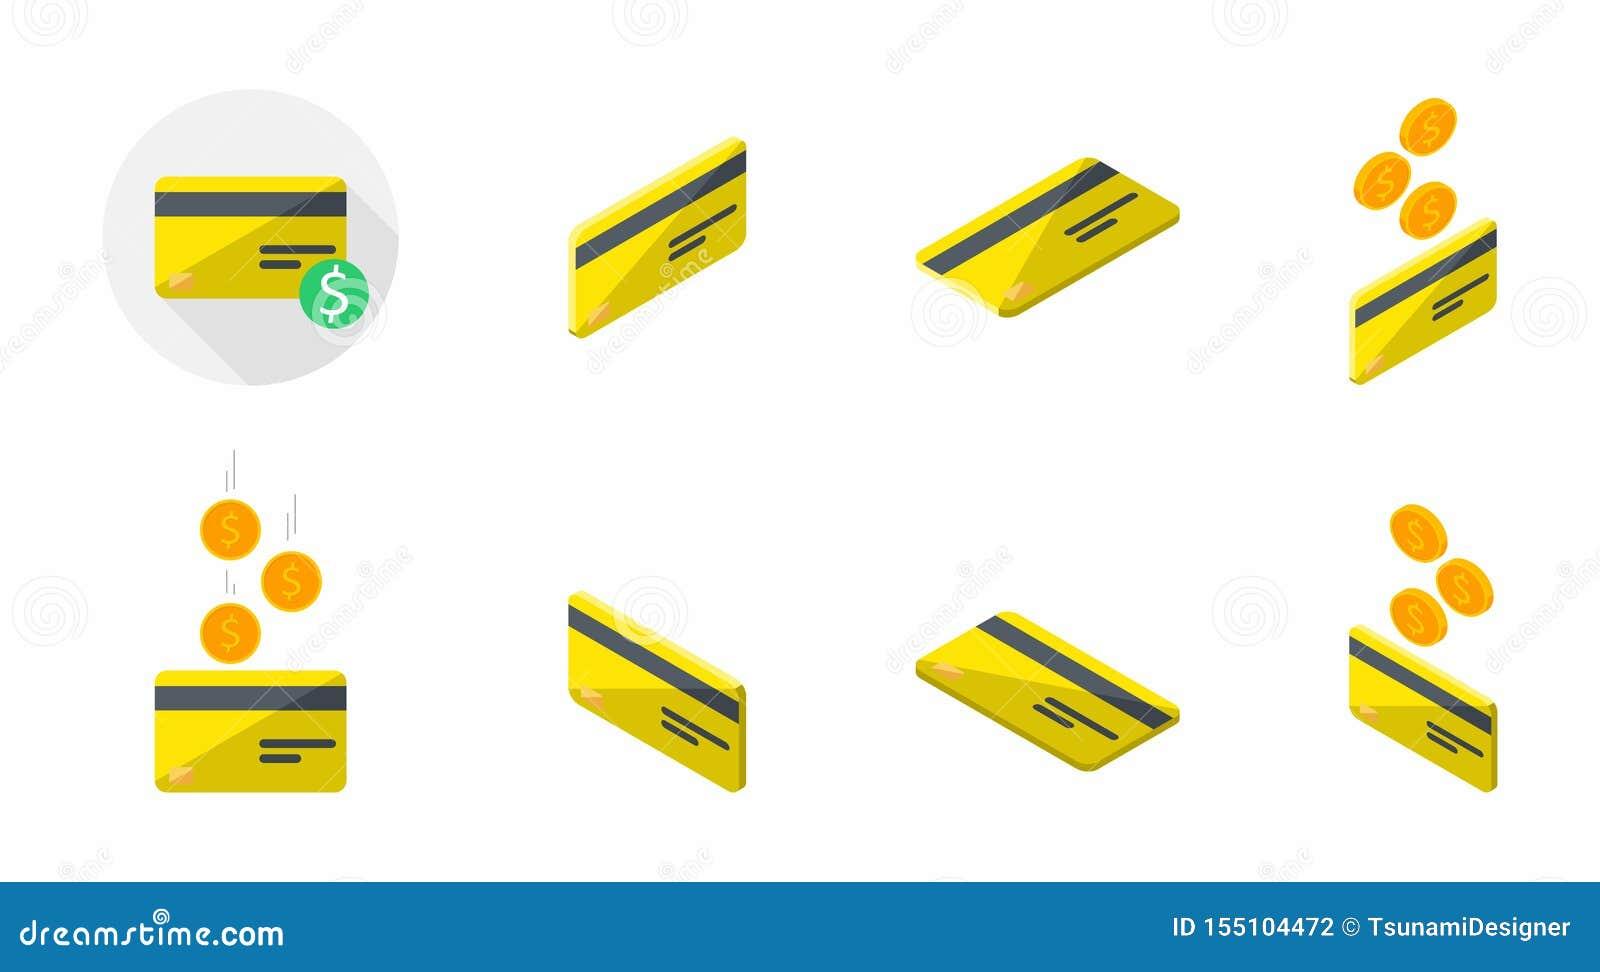 yellow credit card bank card isometric finance